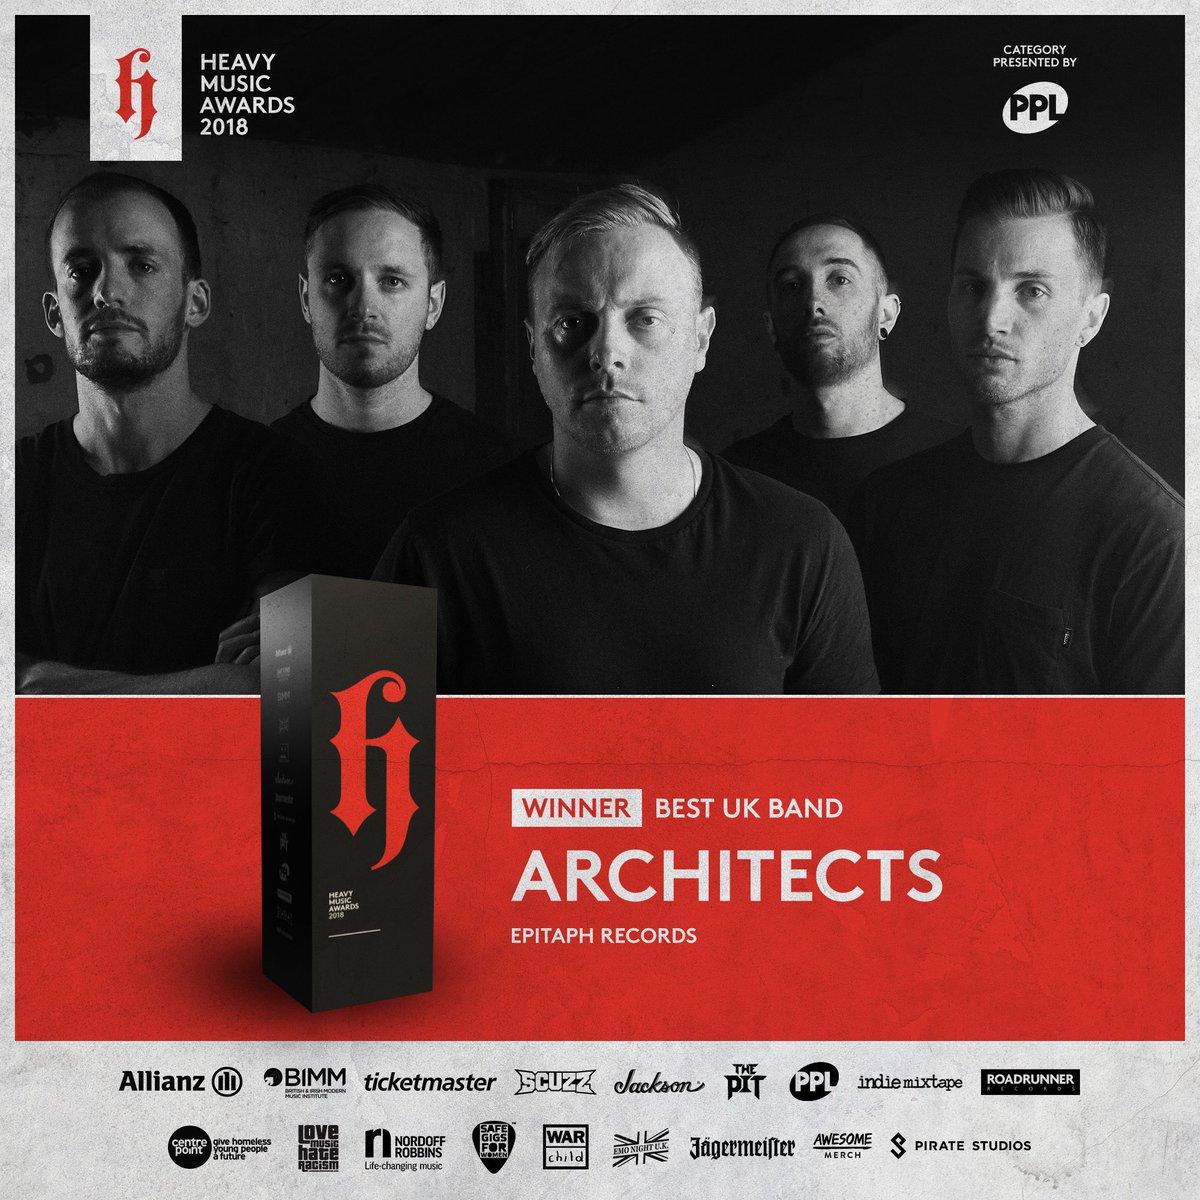 RT @heavymusicawds: #HMA18 #WINNER Best UK Band presented by PPL: Architects  @PPLUK @Architectsuk @epitaphrecords https://t.co/YjX1gDBhE8